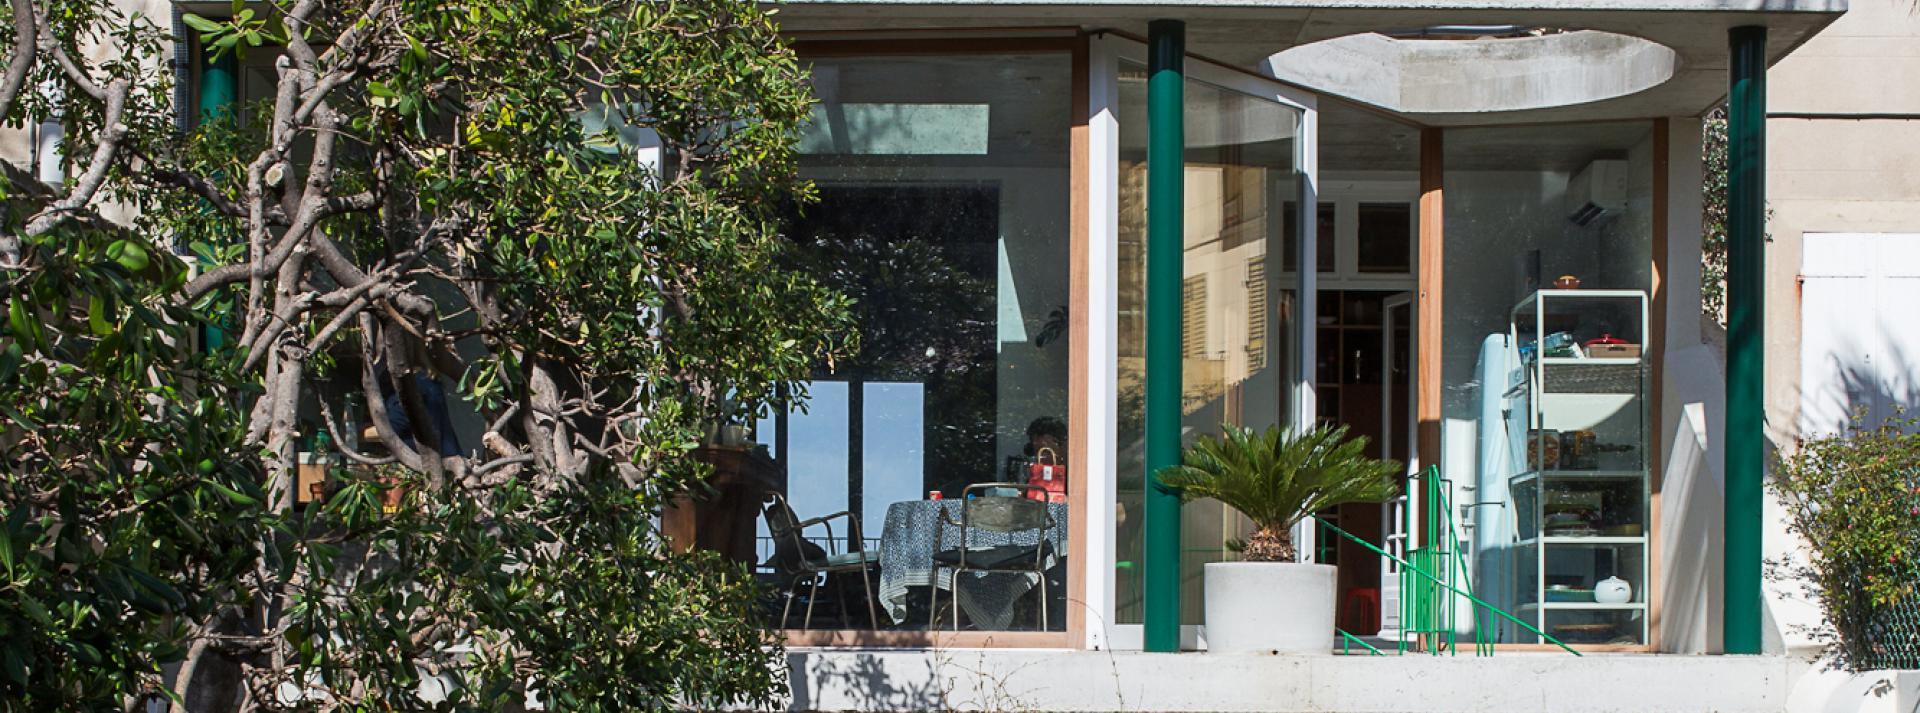 structures usages par fran ois chas nicolas gu rin fabrice long paul ma tre devallon. Black Bedroom Furniture Sets. Home Design Ideas